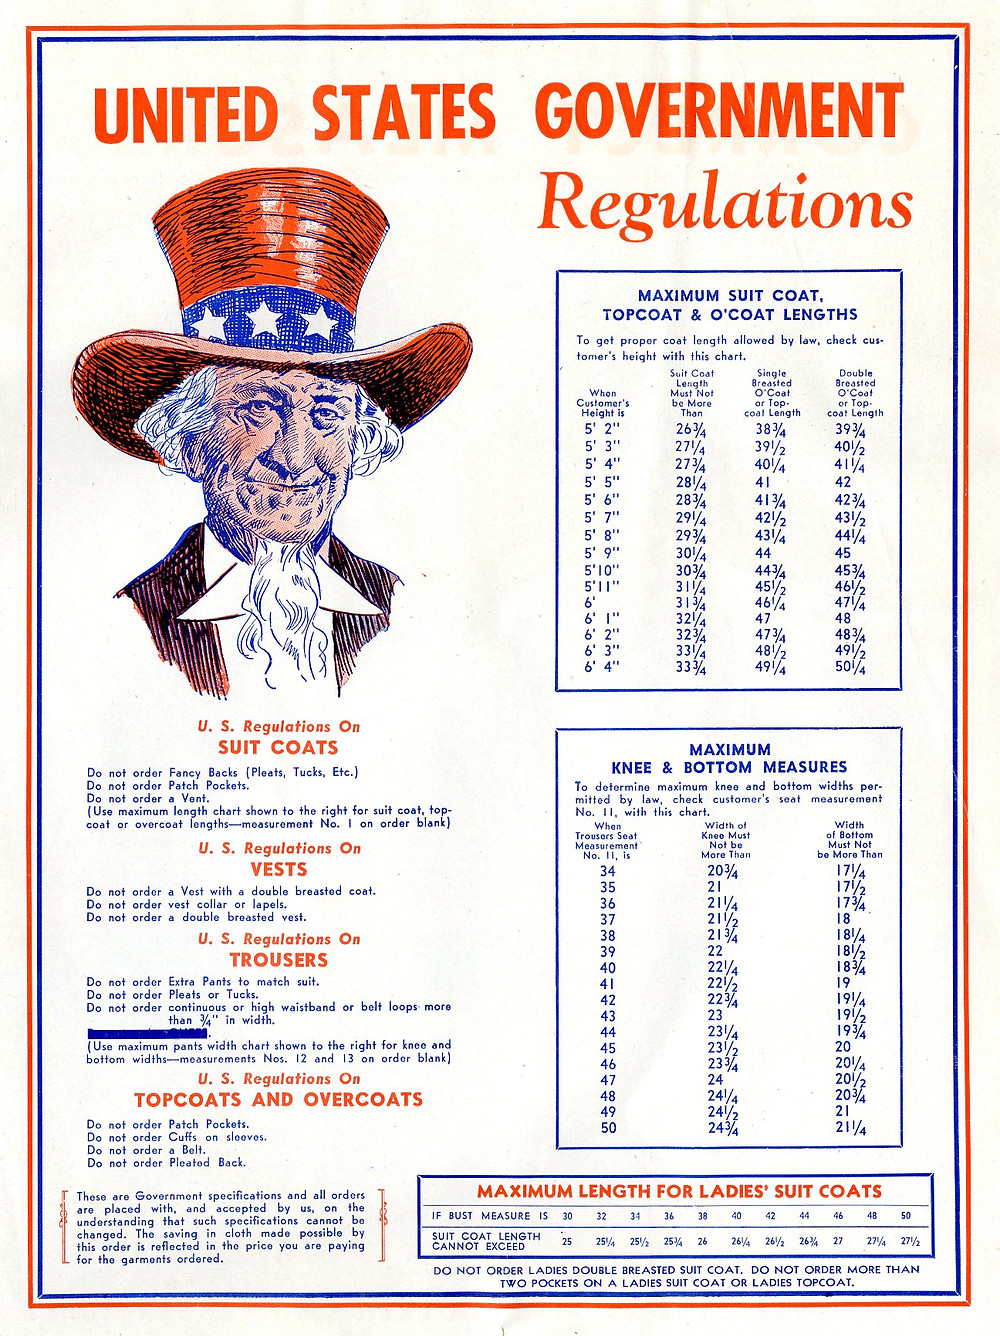 1940s fashion government regulations